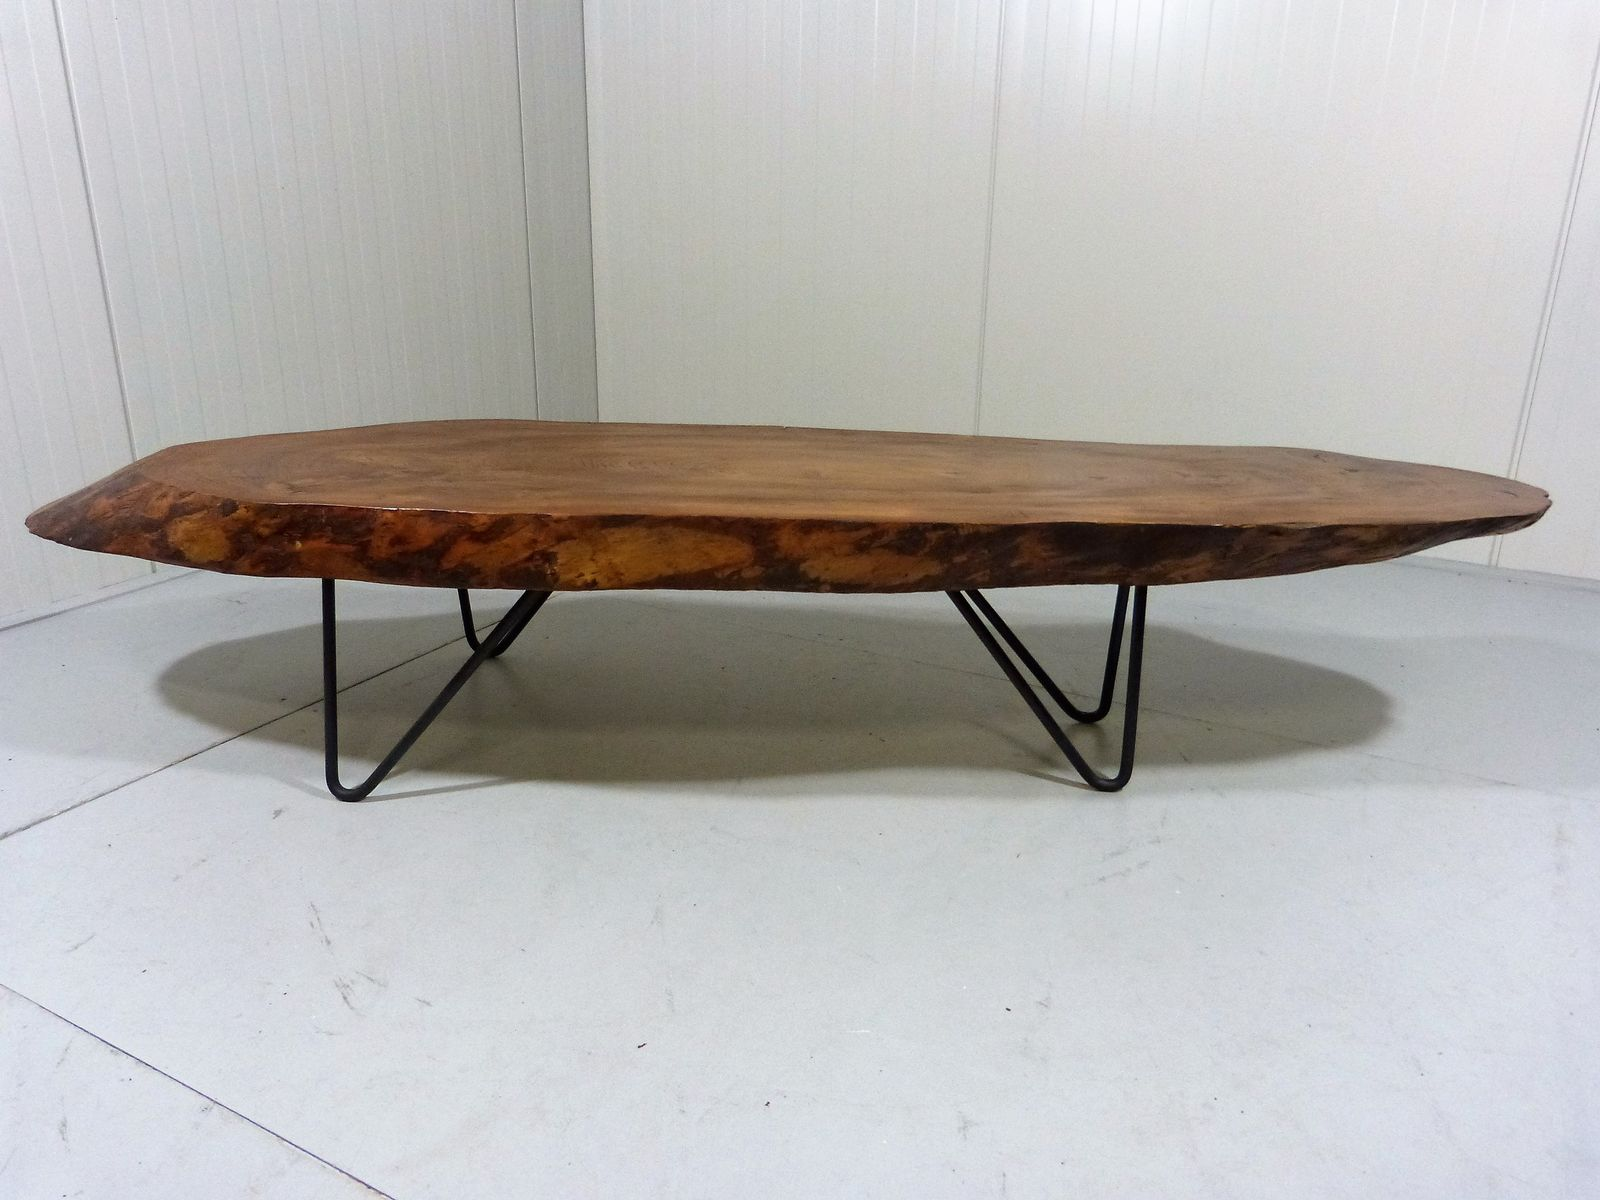 table basse avec tronc darbre. Black Bedroom Furniture Sets. Home Design Ideas